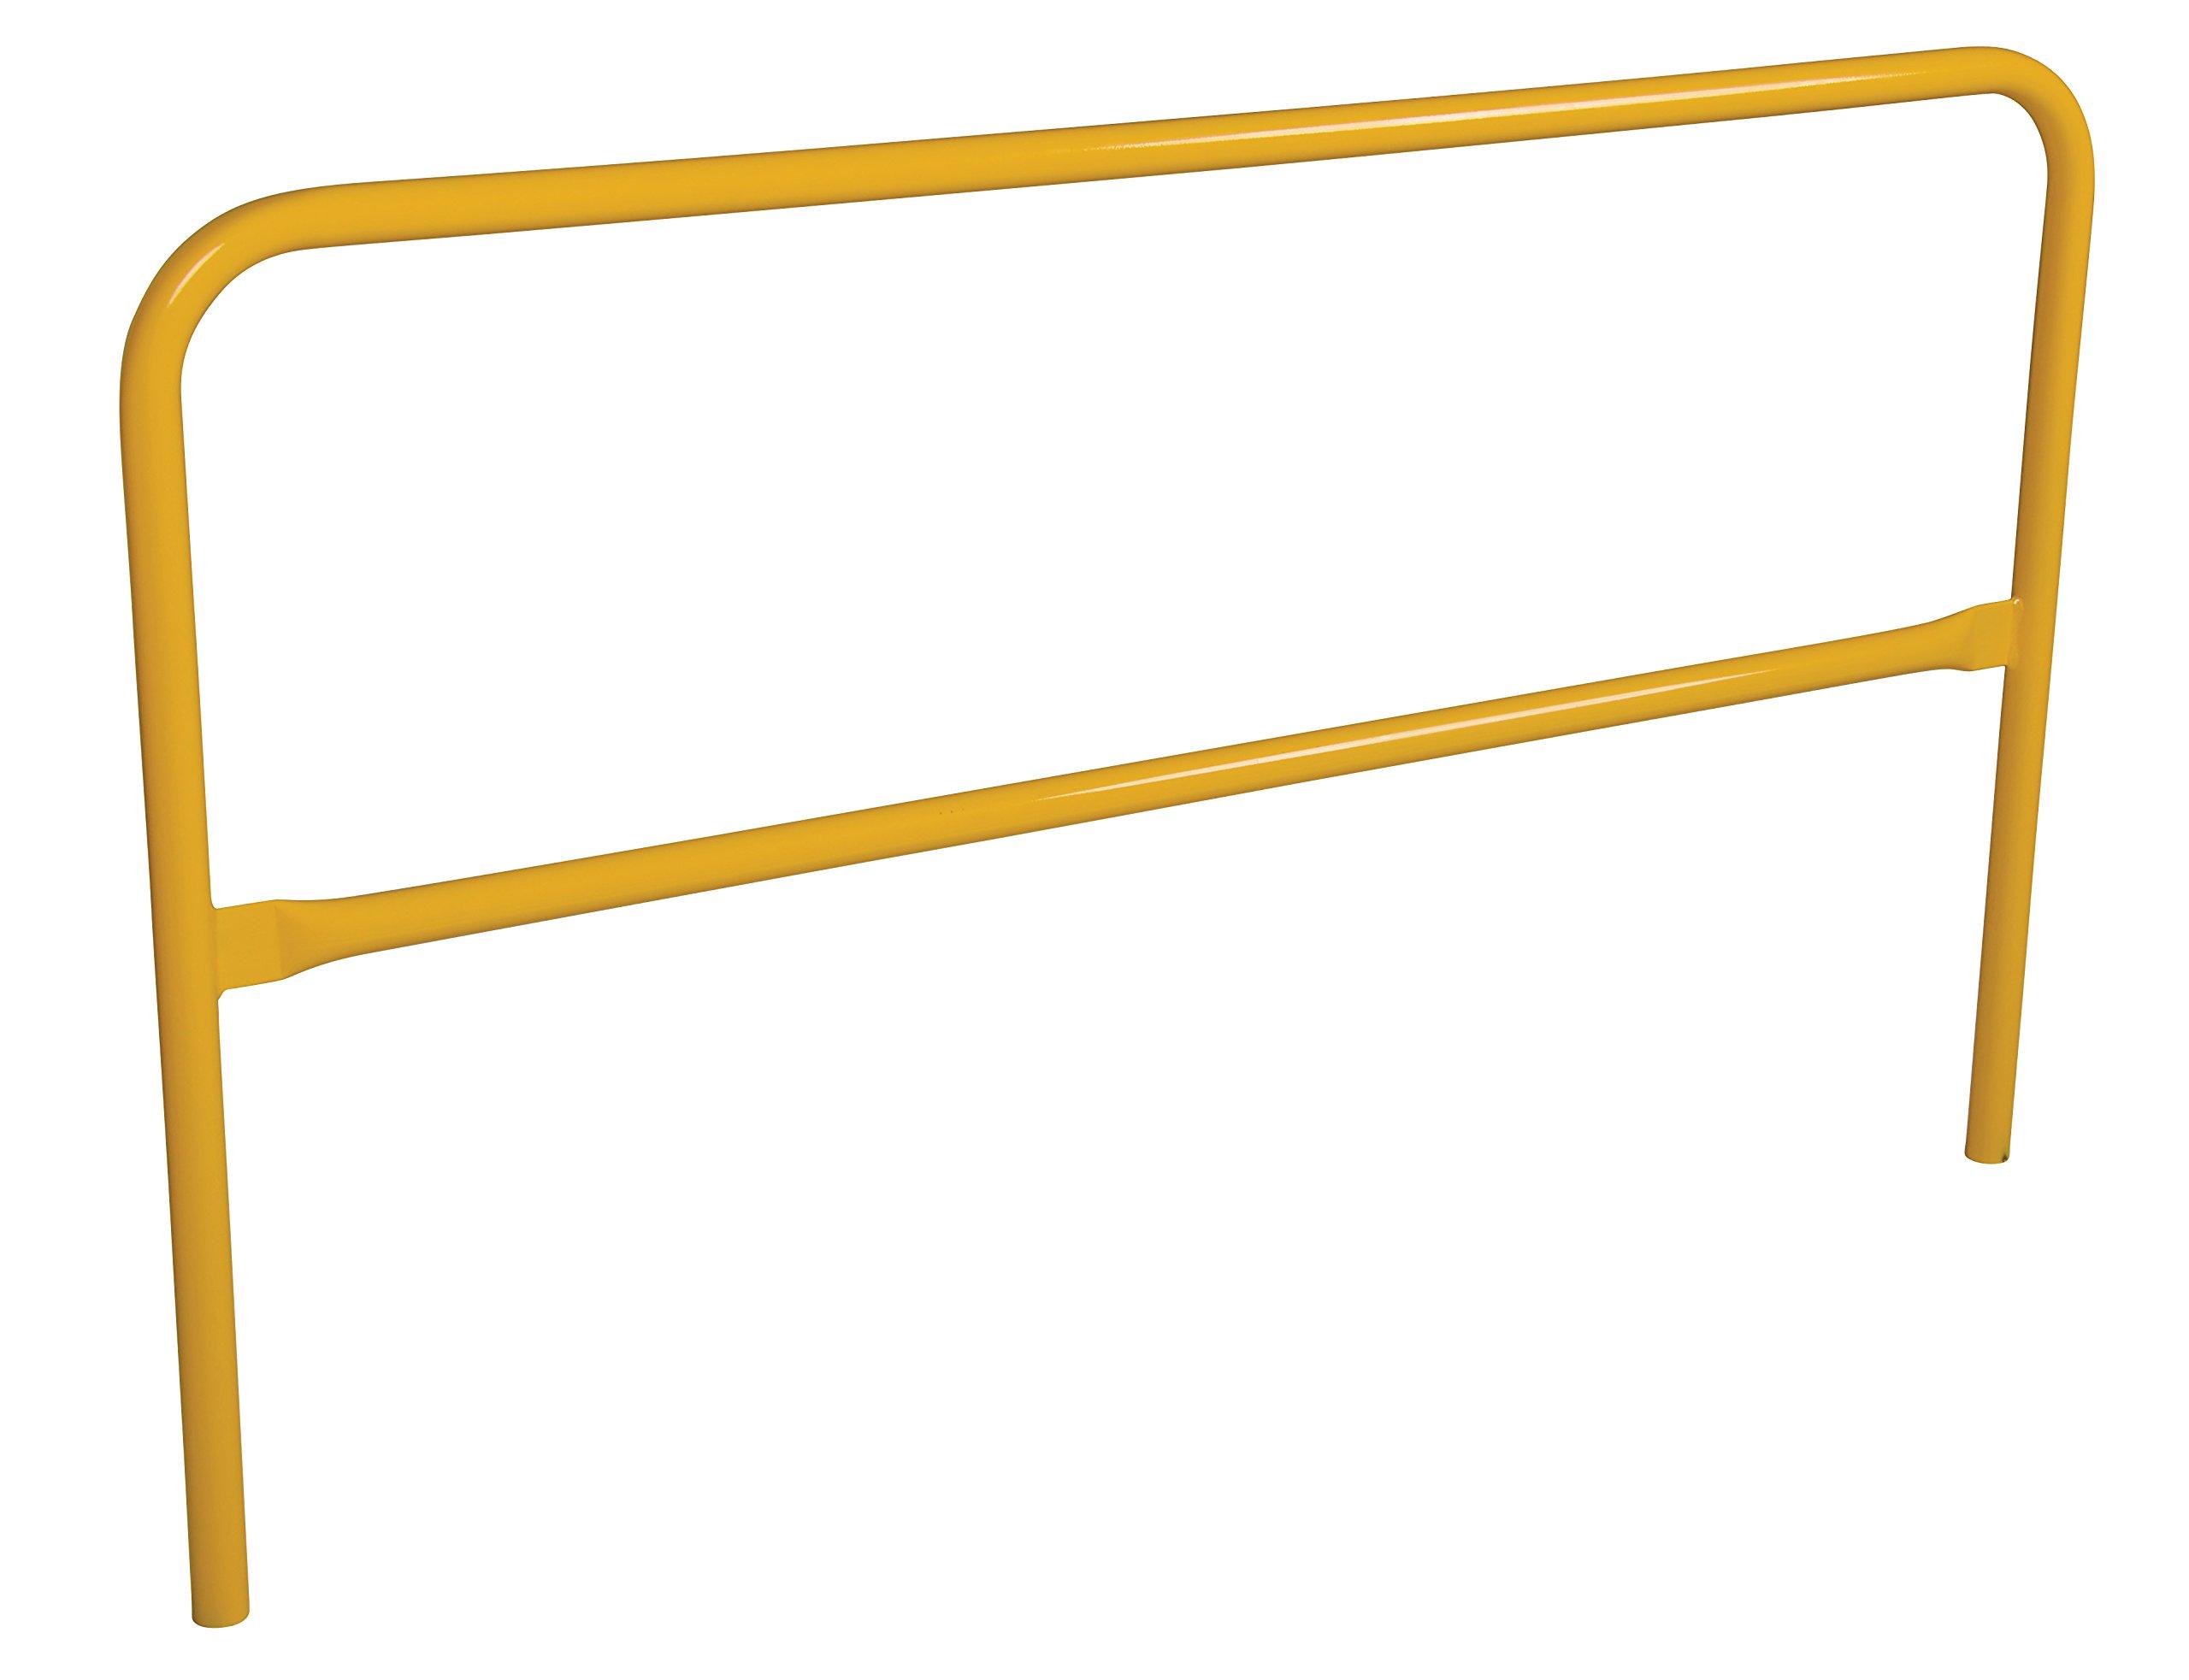 Vestil Pipe Safety Railing - Steel, 72in.L, Model# VDKR-6 by Vestil